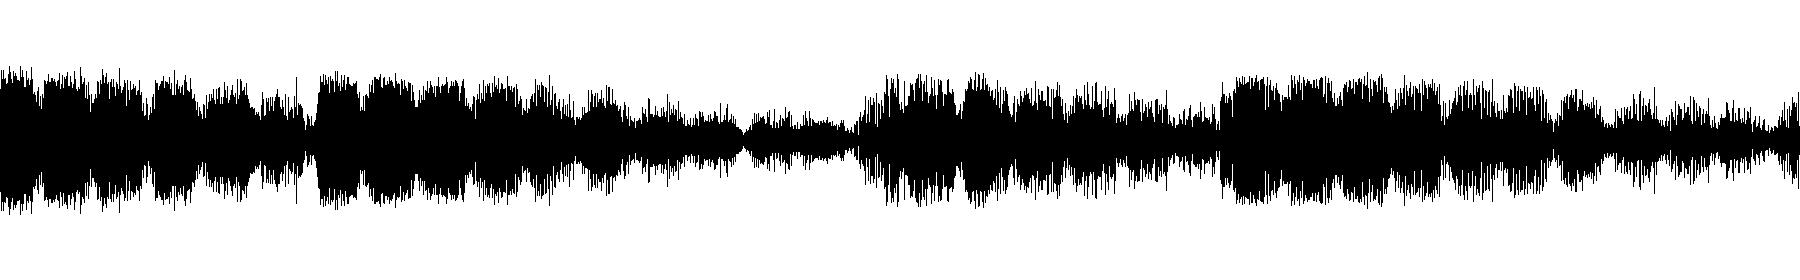 blbc dustygretsch 95 c